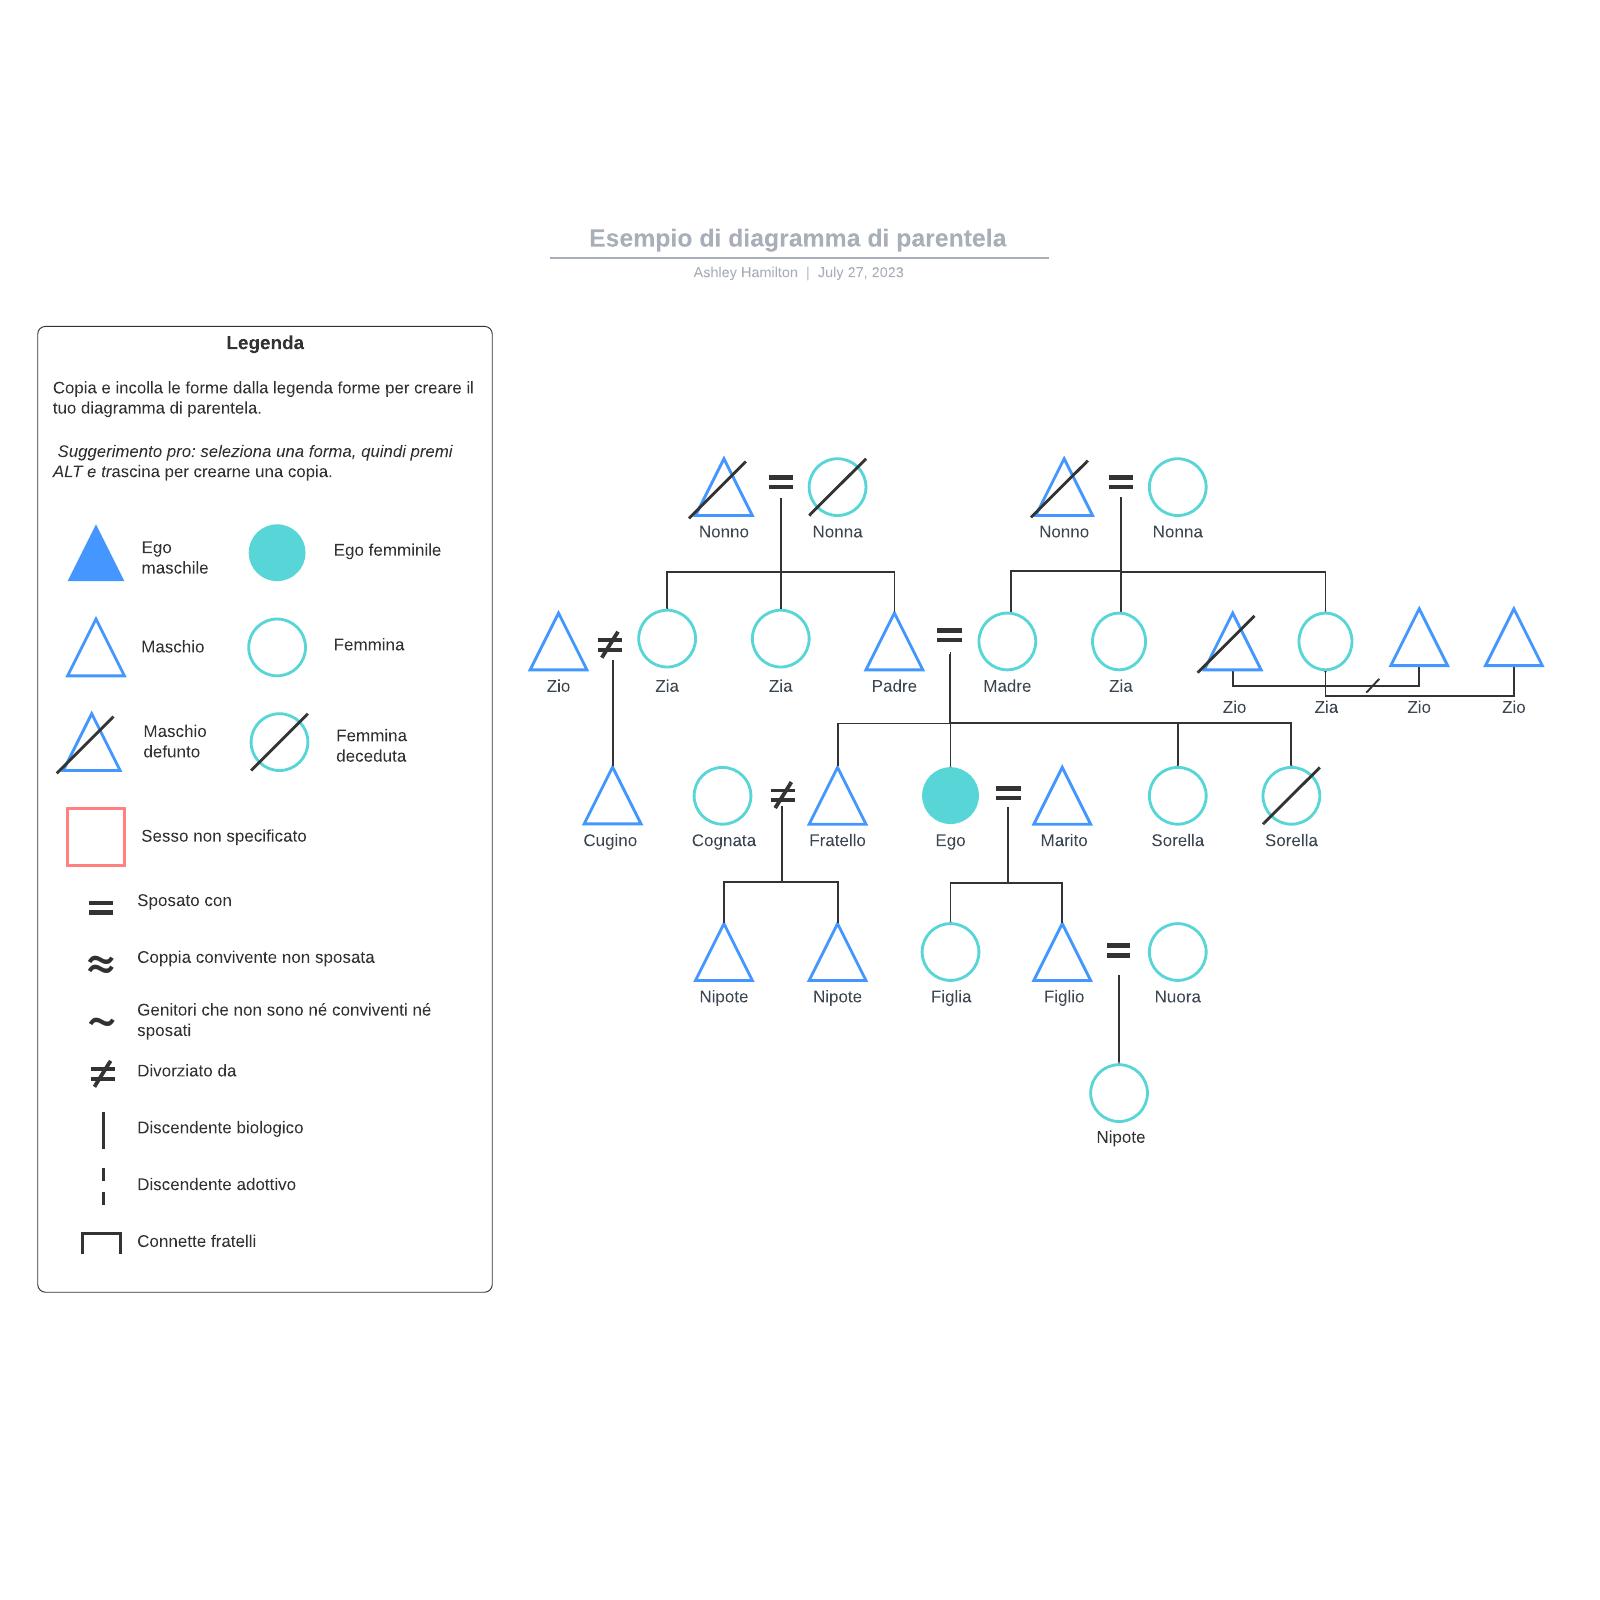 Esempio di diagramma di parentela